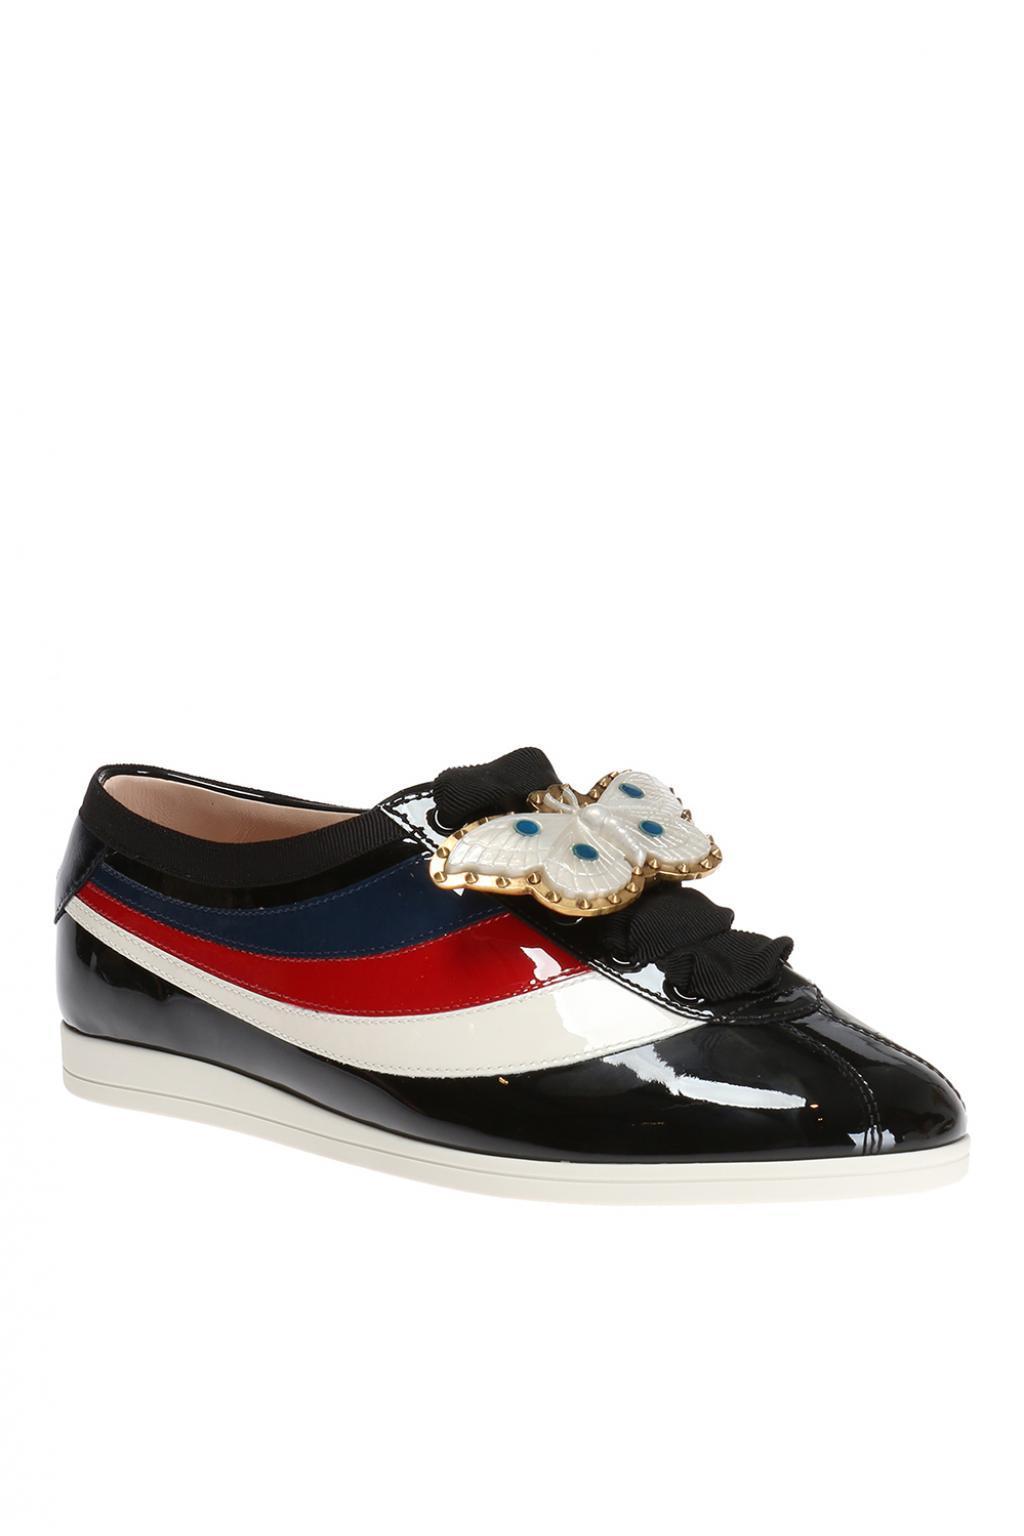 ad7da522553 Gucci - Black  falacer  Sneakers - Lyst. View fullscreen